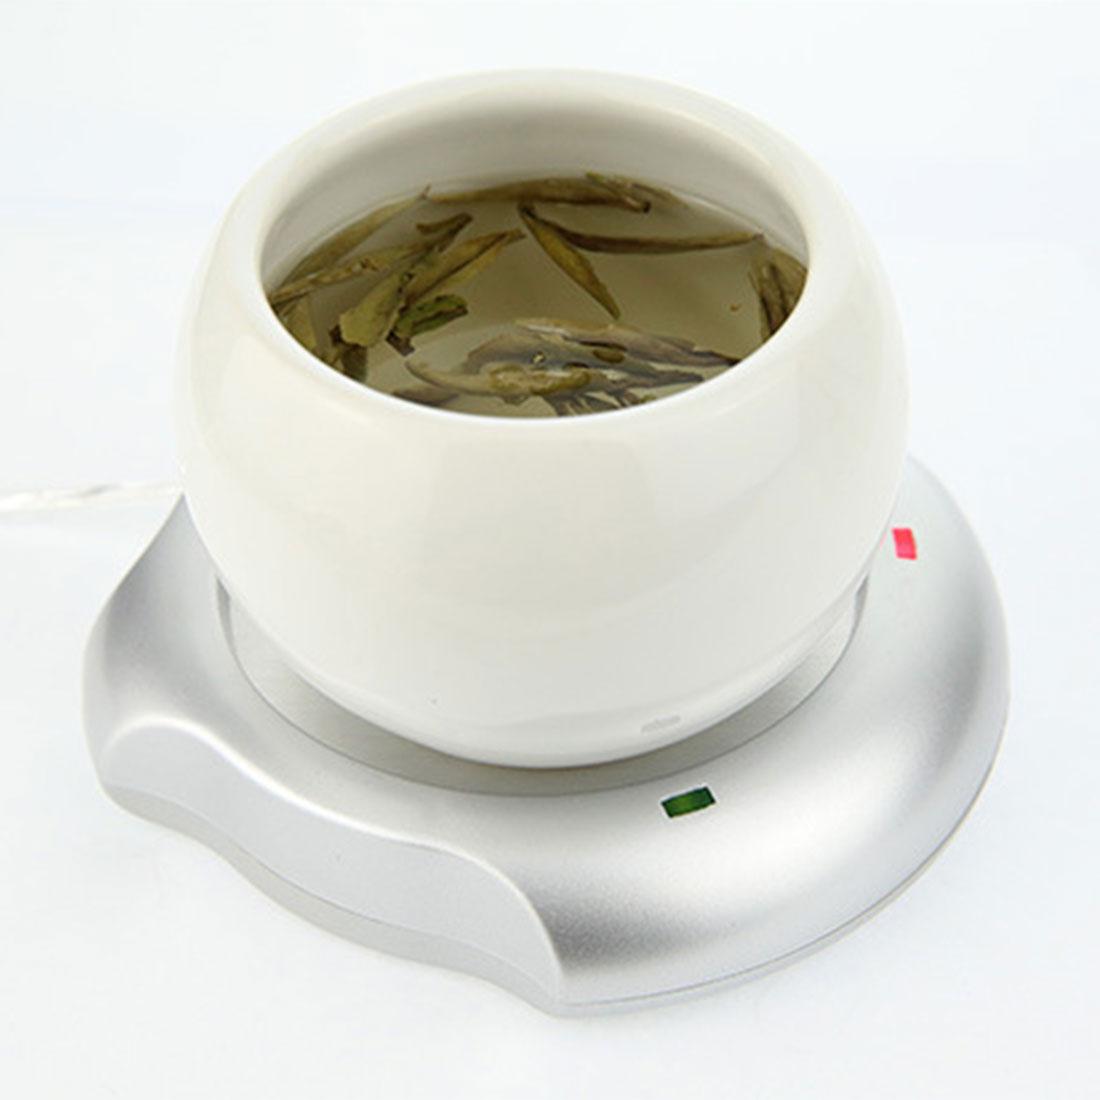 Electric Coffee Mug Warmer with USB Charging Interface for Tea/Coffee/Milk Heating